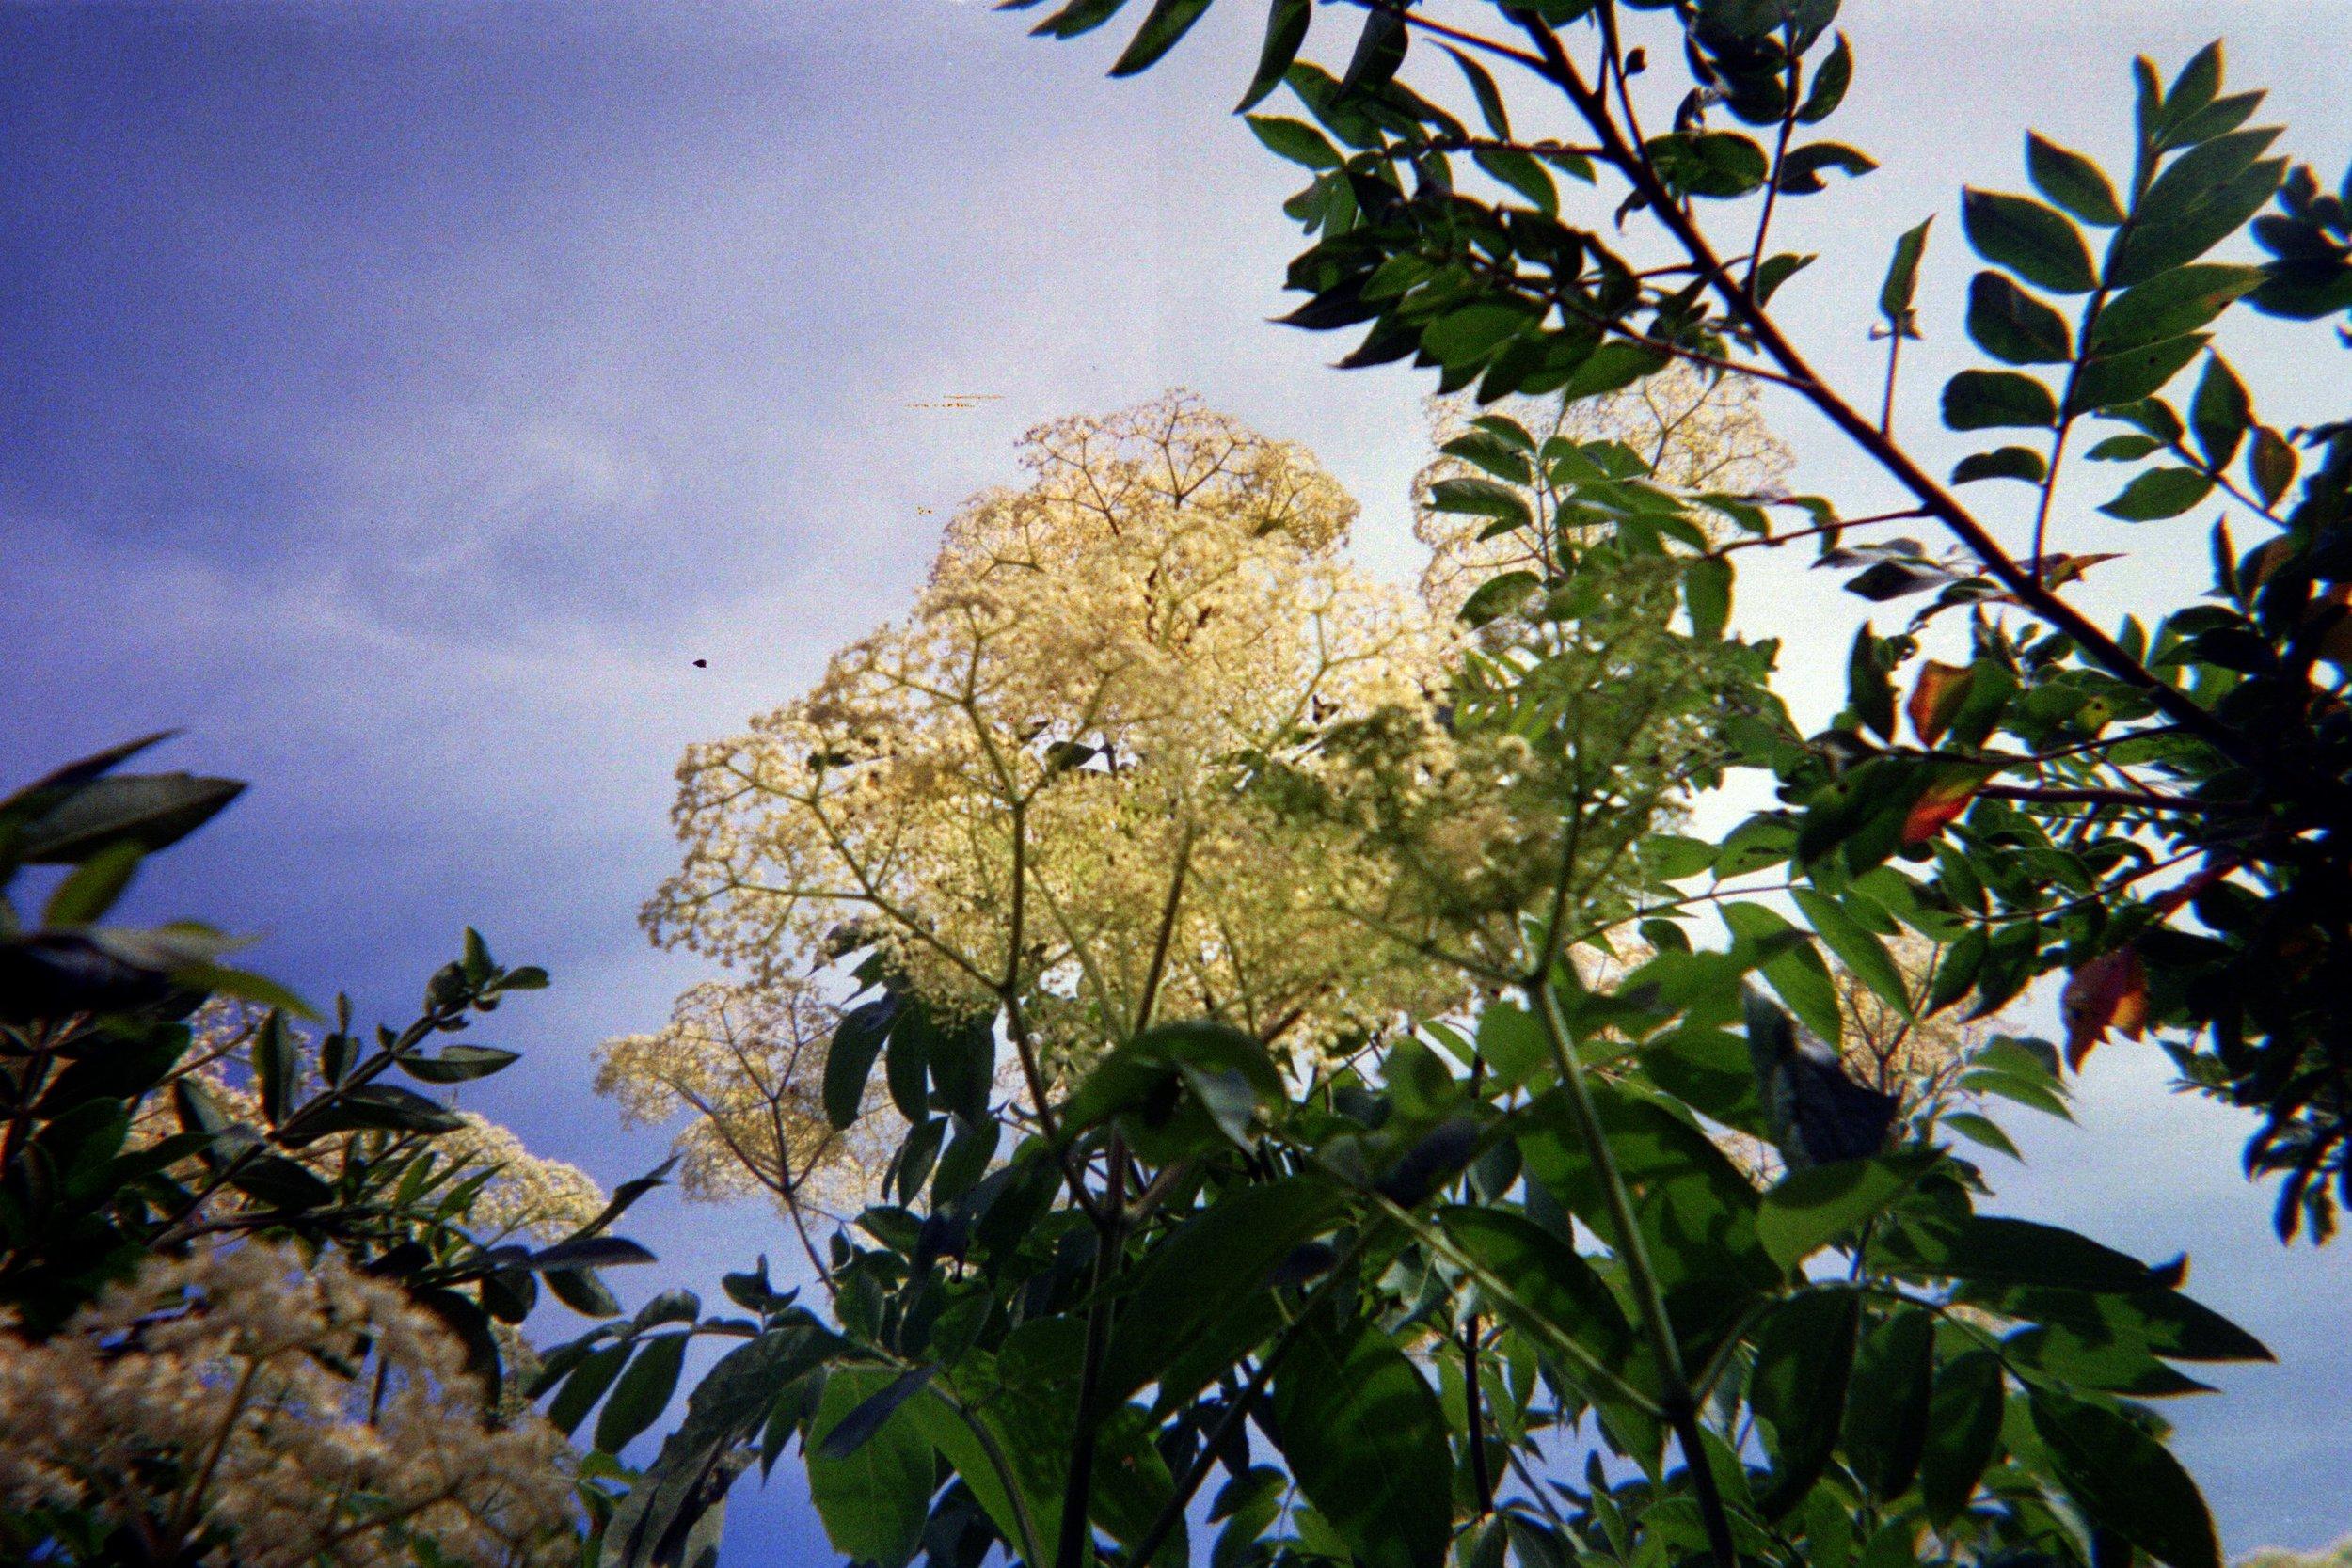 Elder blossoms soaking up the Vineyard sun last summer.